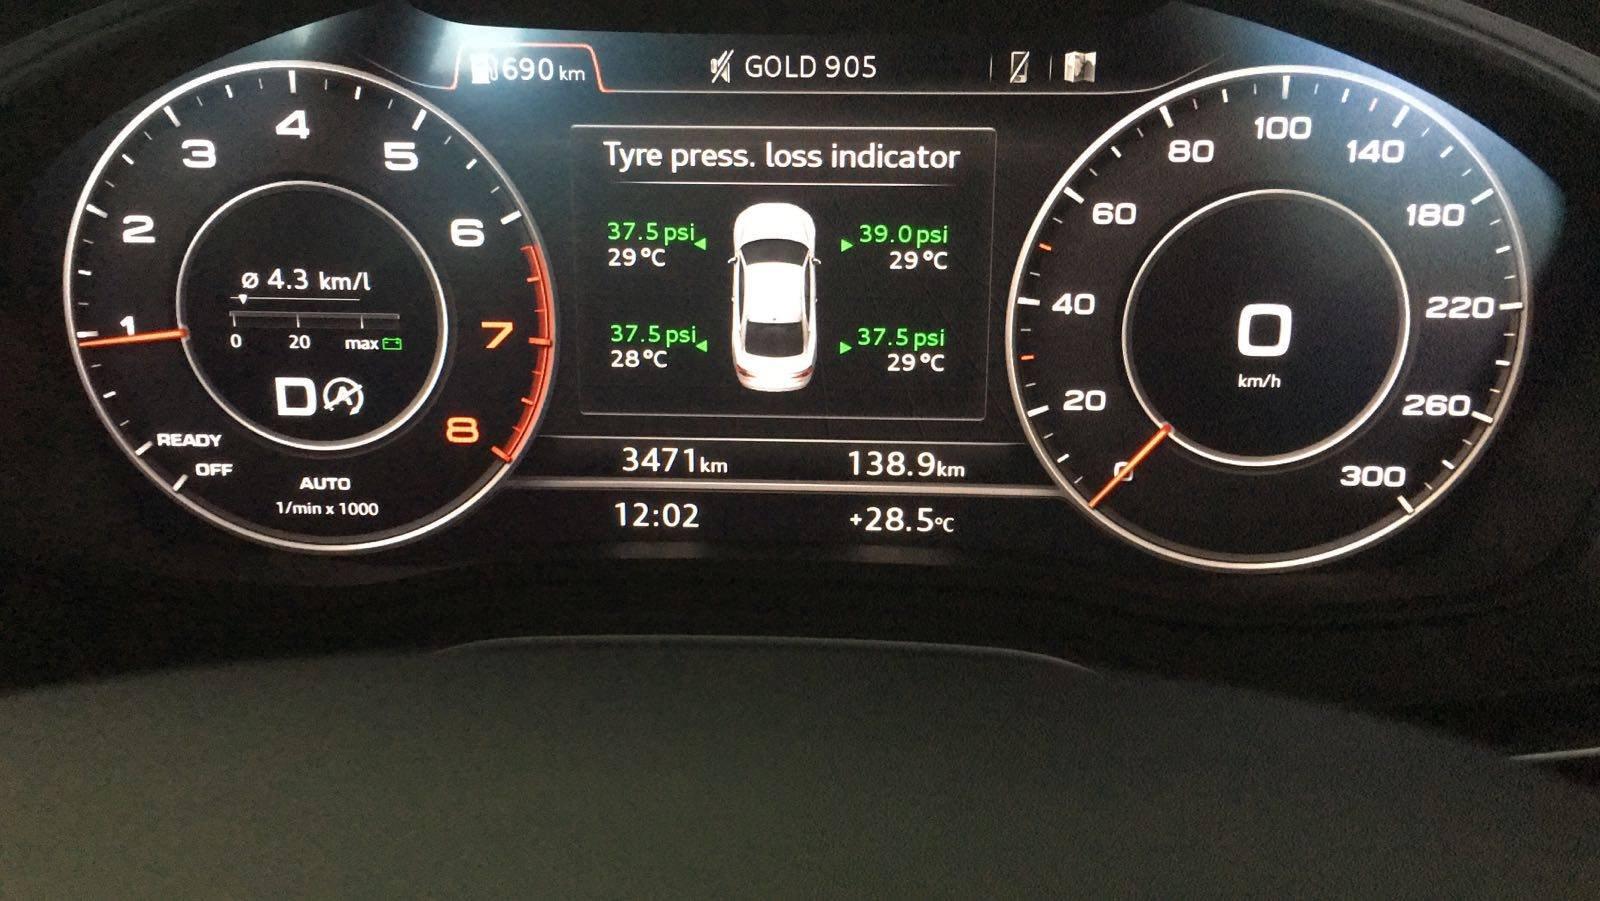 Proper TPMS for B9 | Audi-Sport net